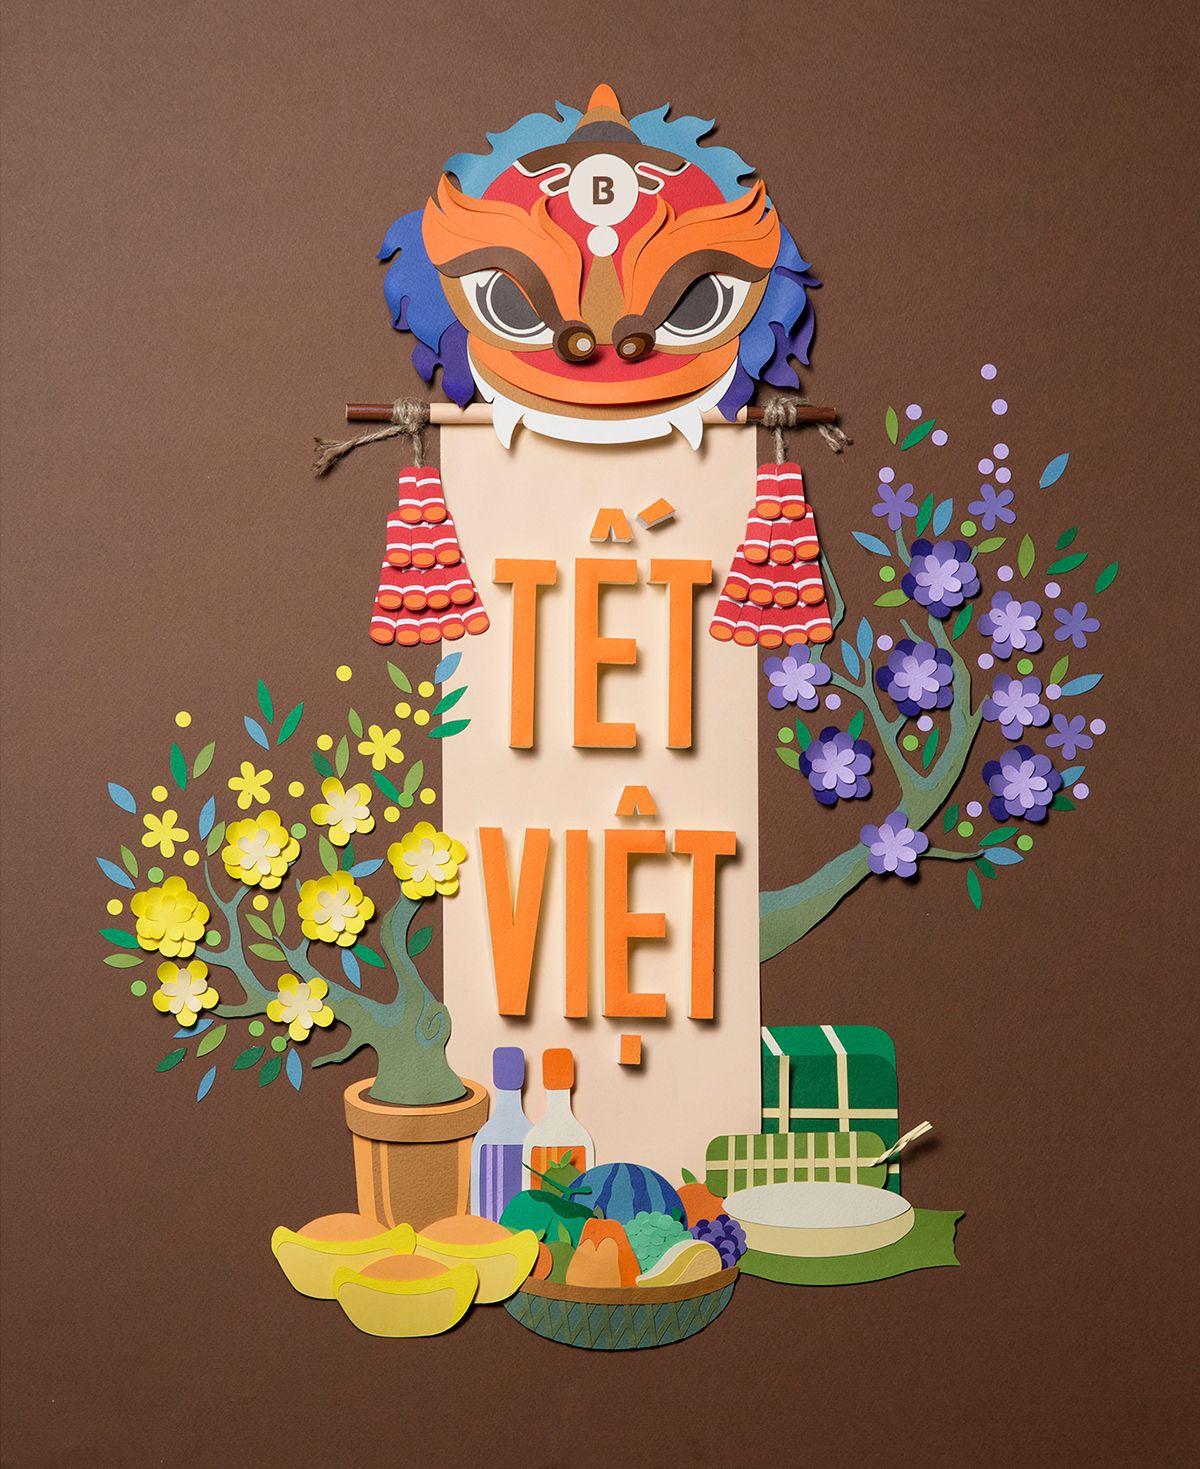 Tet Viet On Behance Holiday Poster New Year Art Handcraft